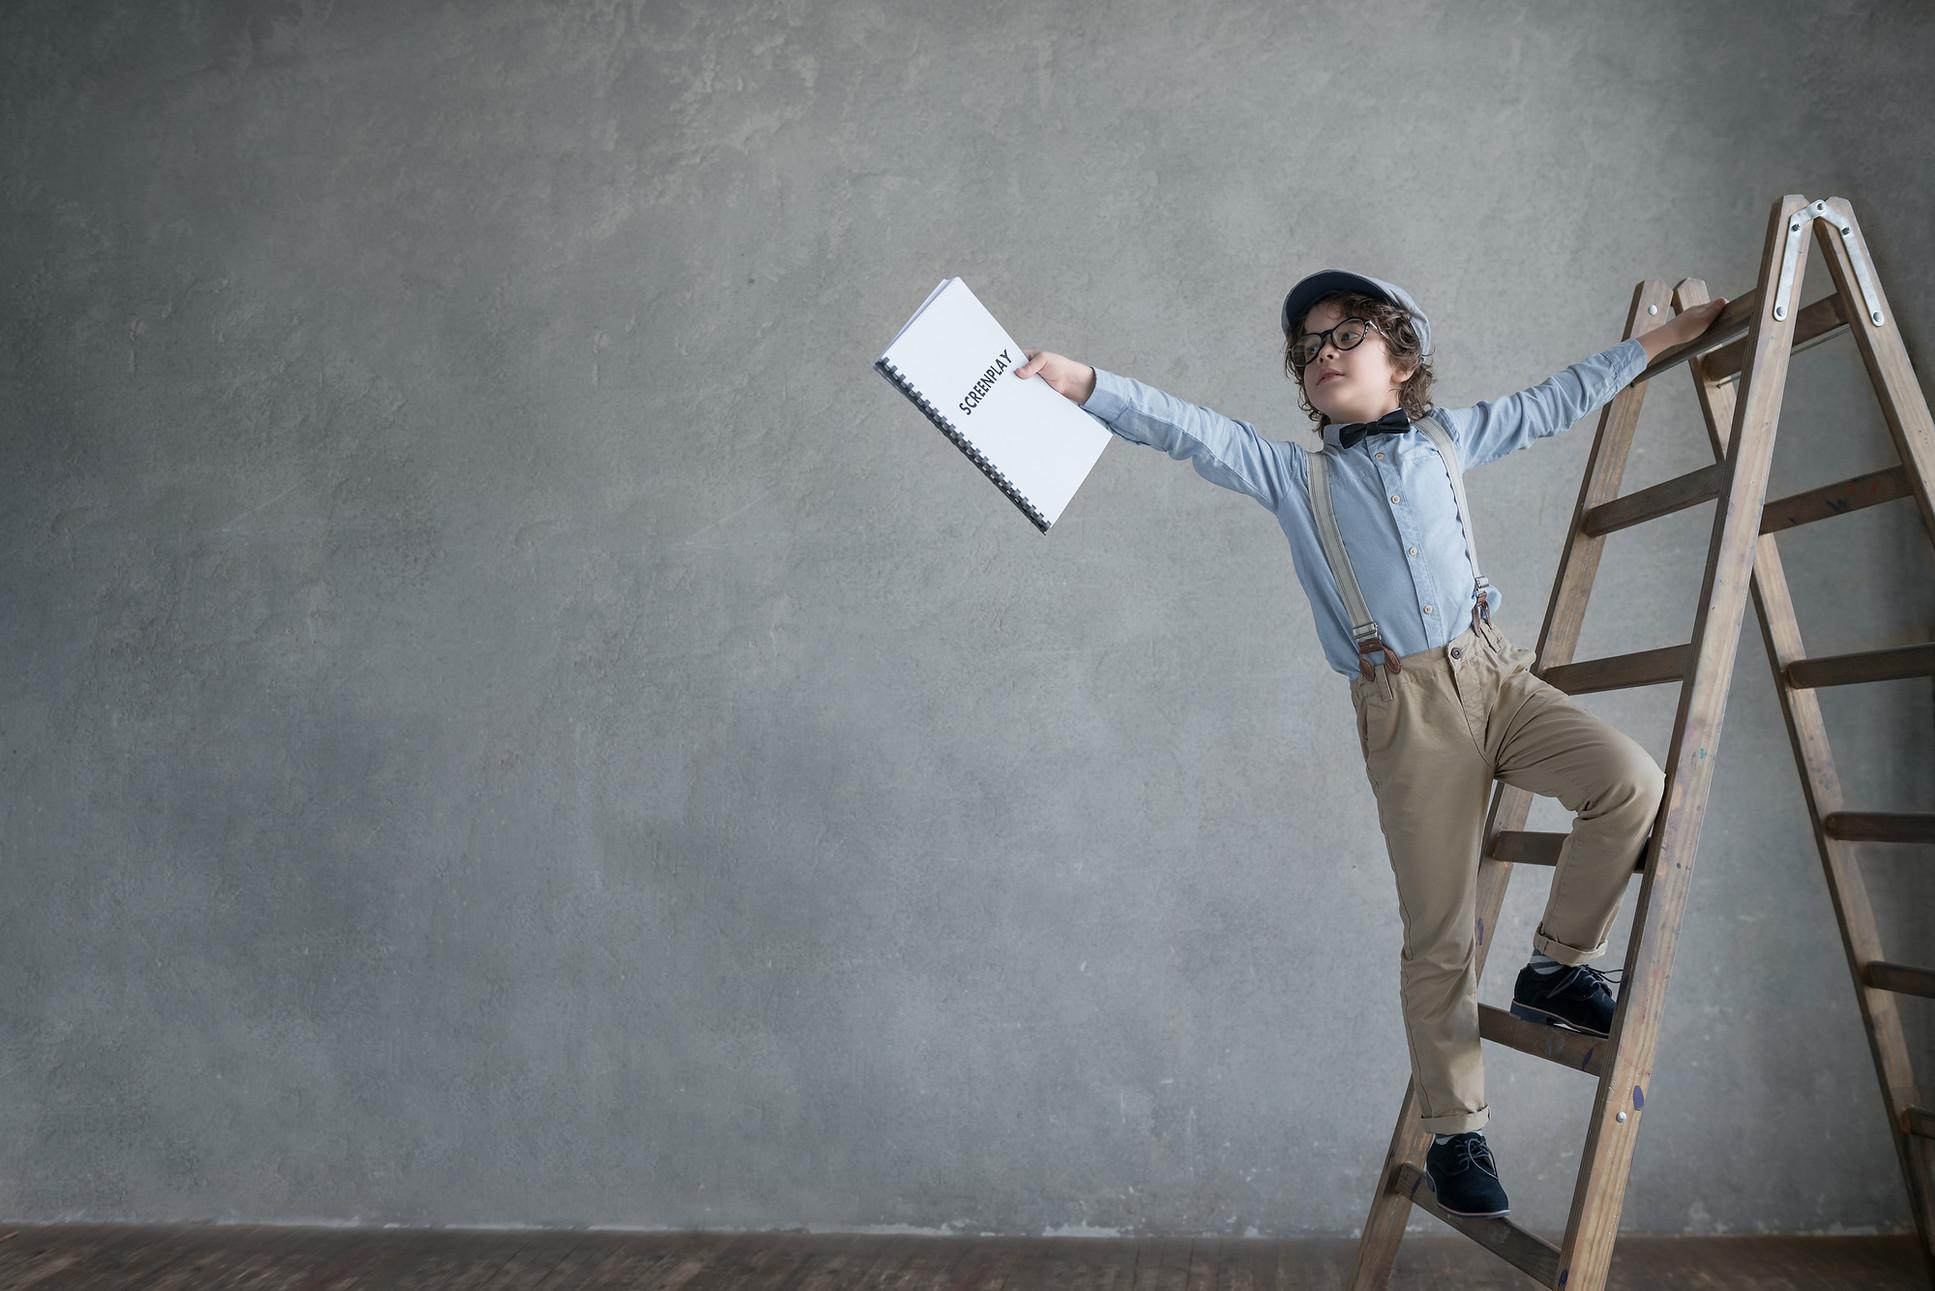 boy-director-on-ladder.jpg